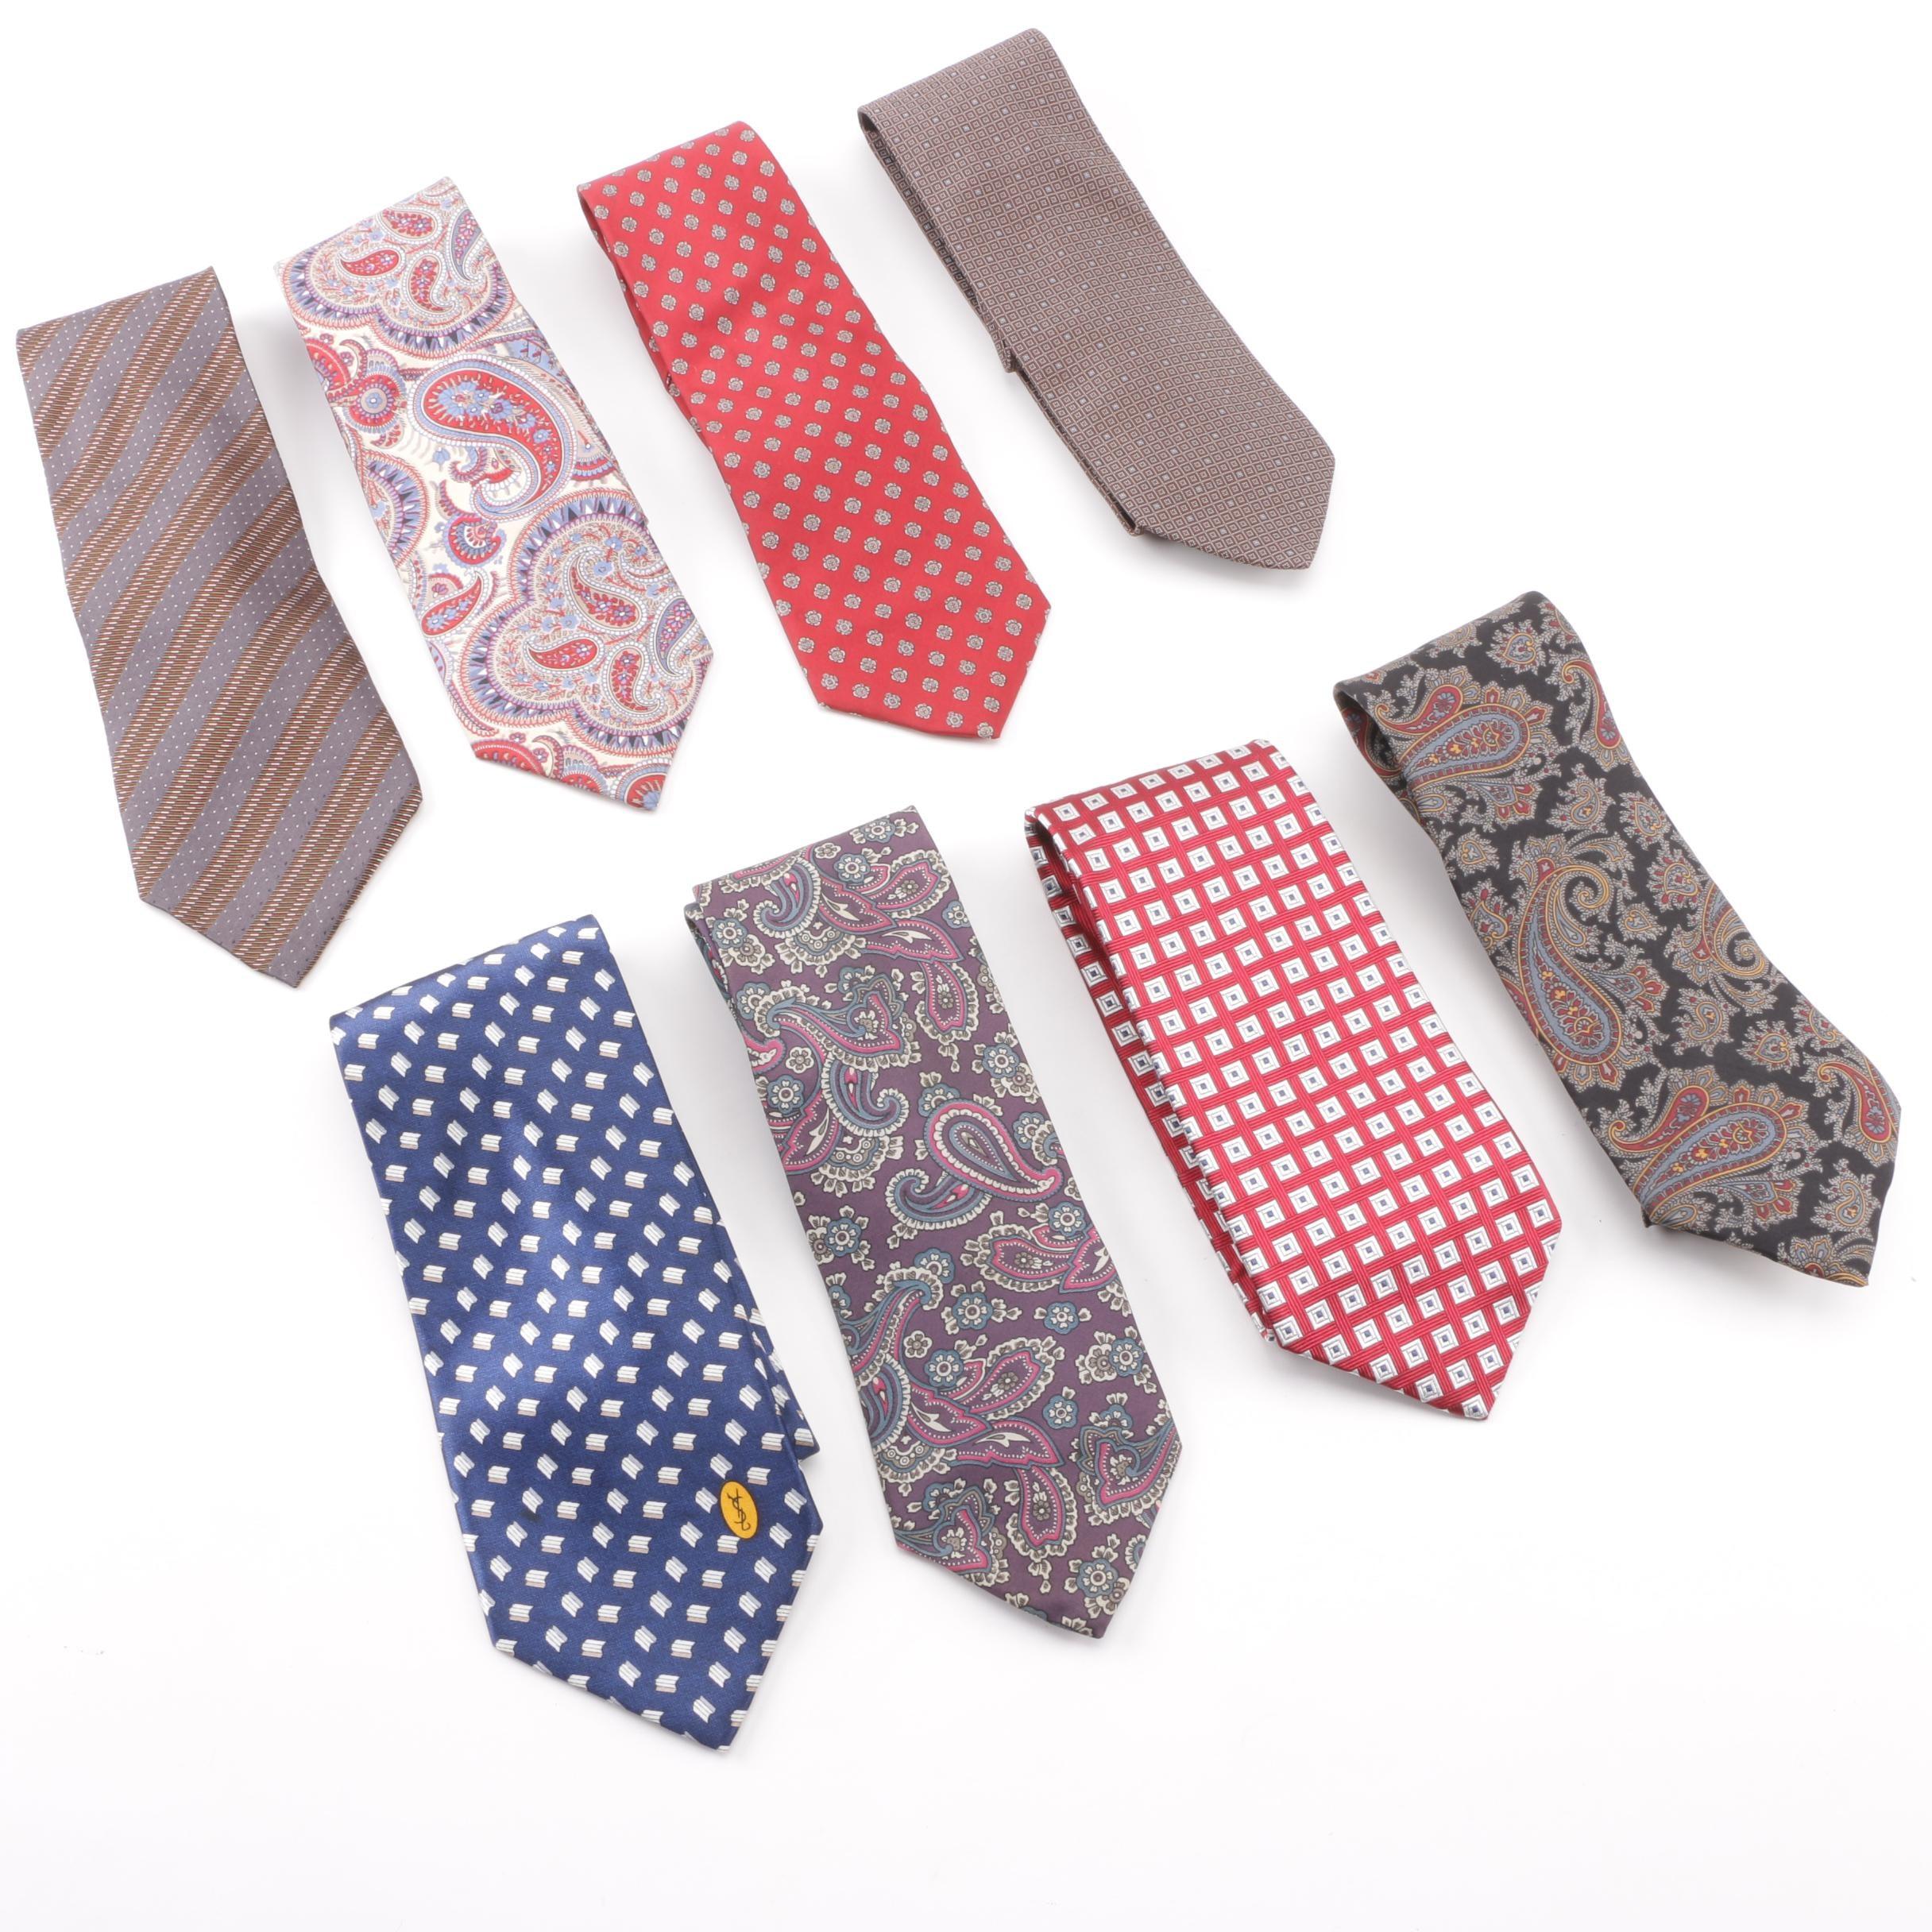 Men's Designer Silk Neckties including Giorgio Armani and Brooks Brothers